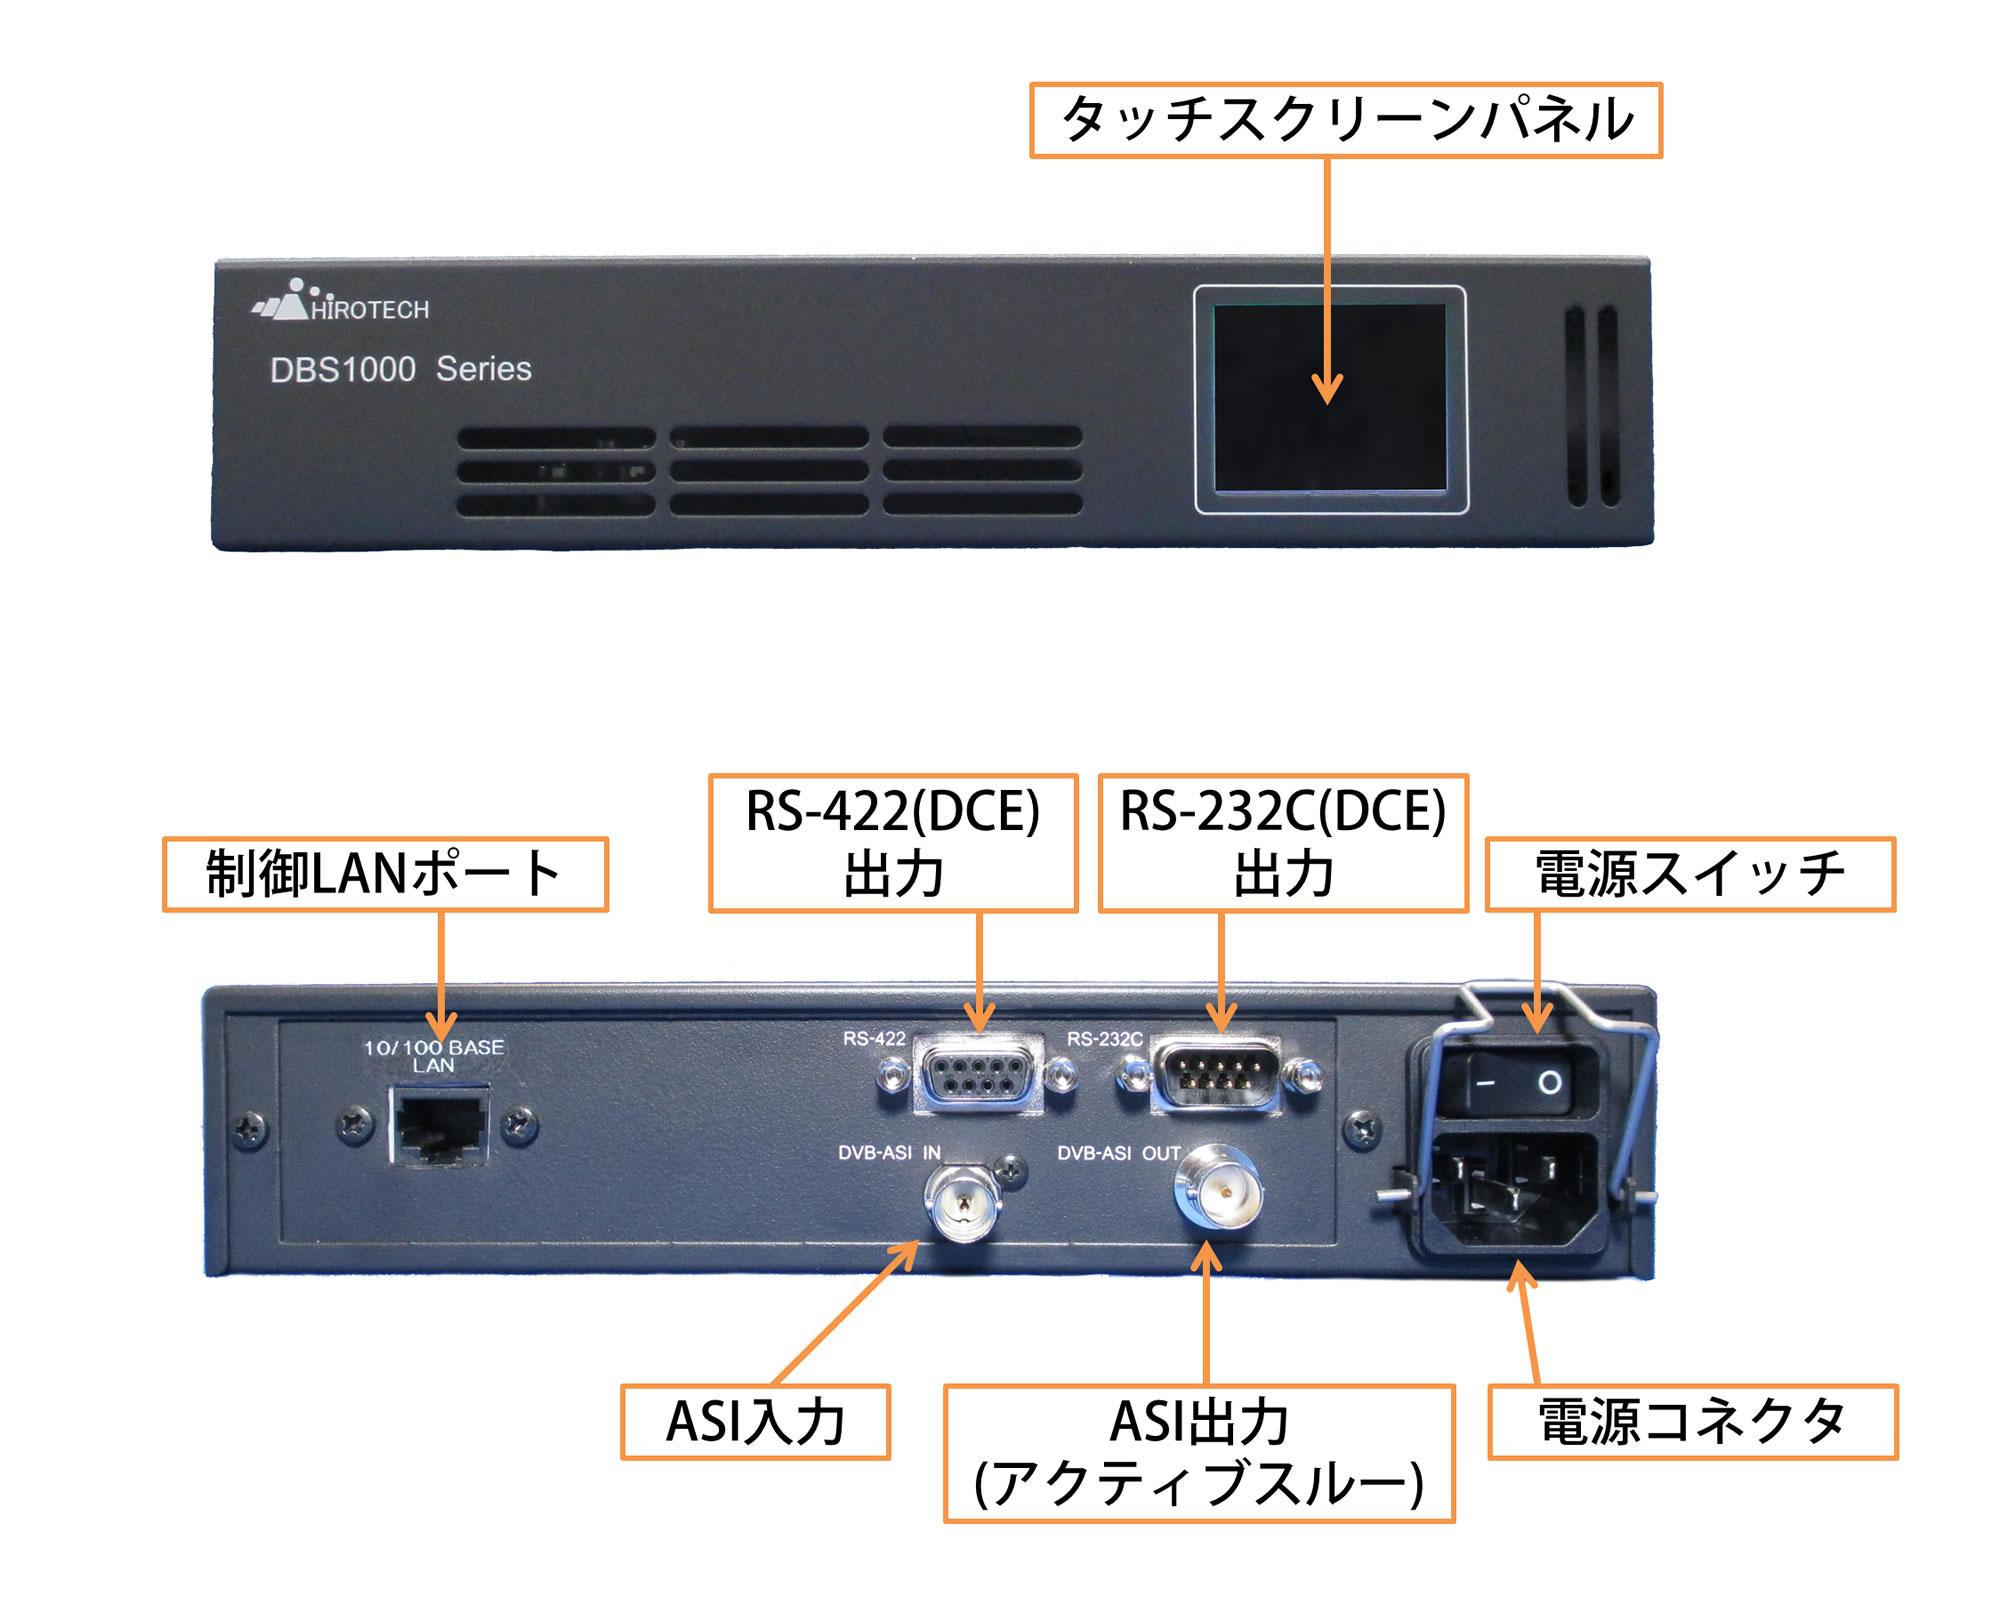 DBS1010インターフェース